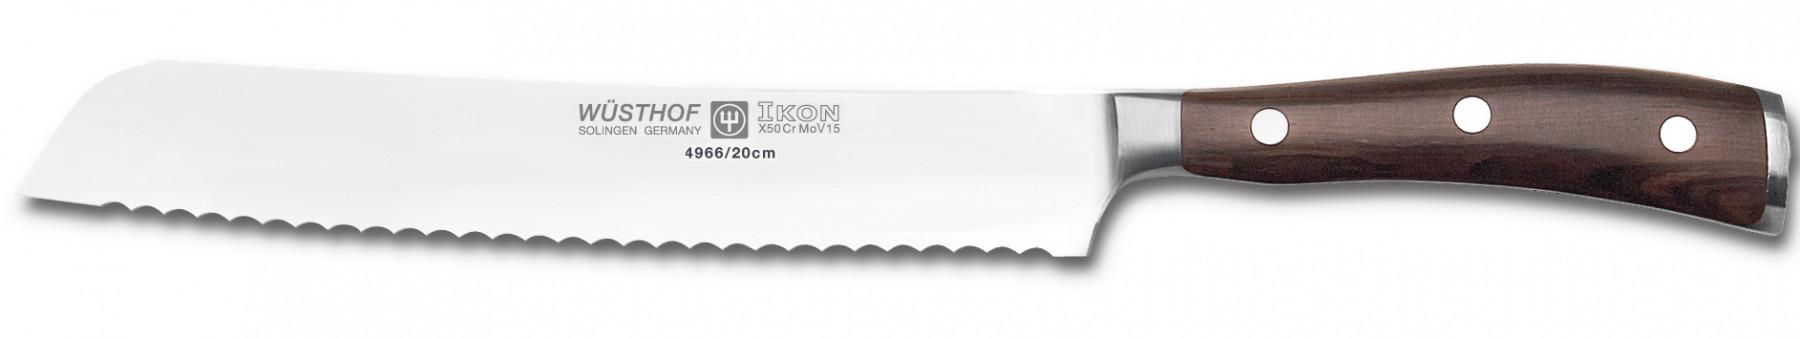 Wüsthof Dreizack Ikon Messerblock 10tlg. Brotmesser